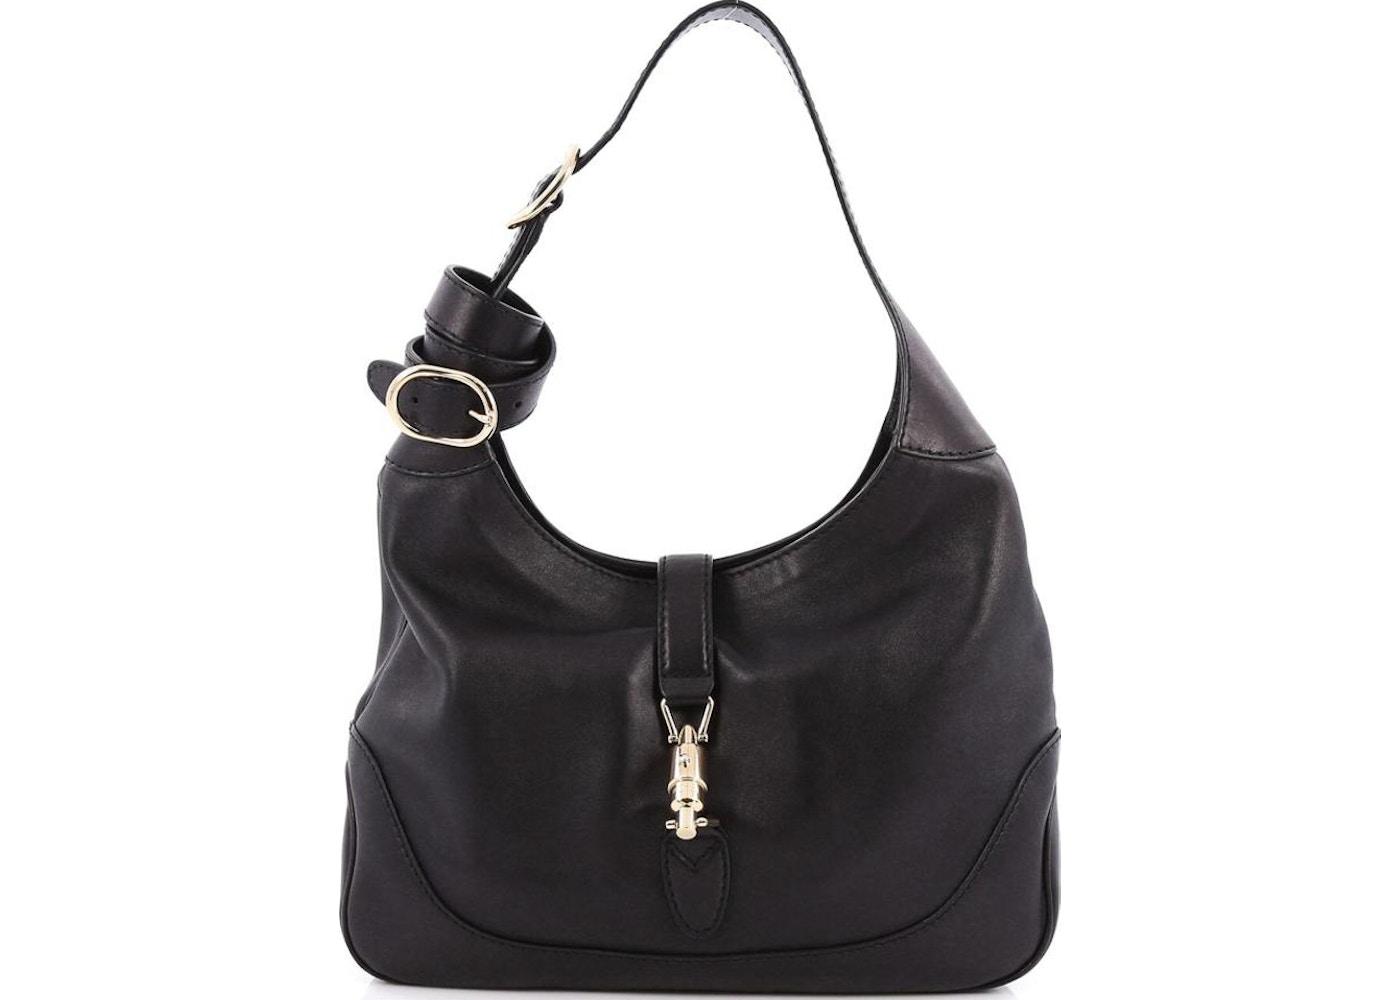 bb09e213a86 Gucci Jackie Shoulder Bag GG Medium Black. GG Medium Black